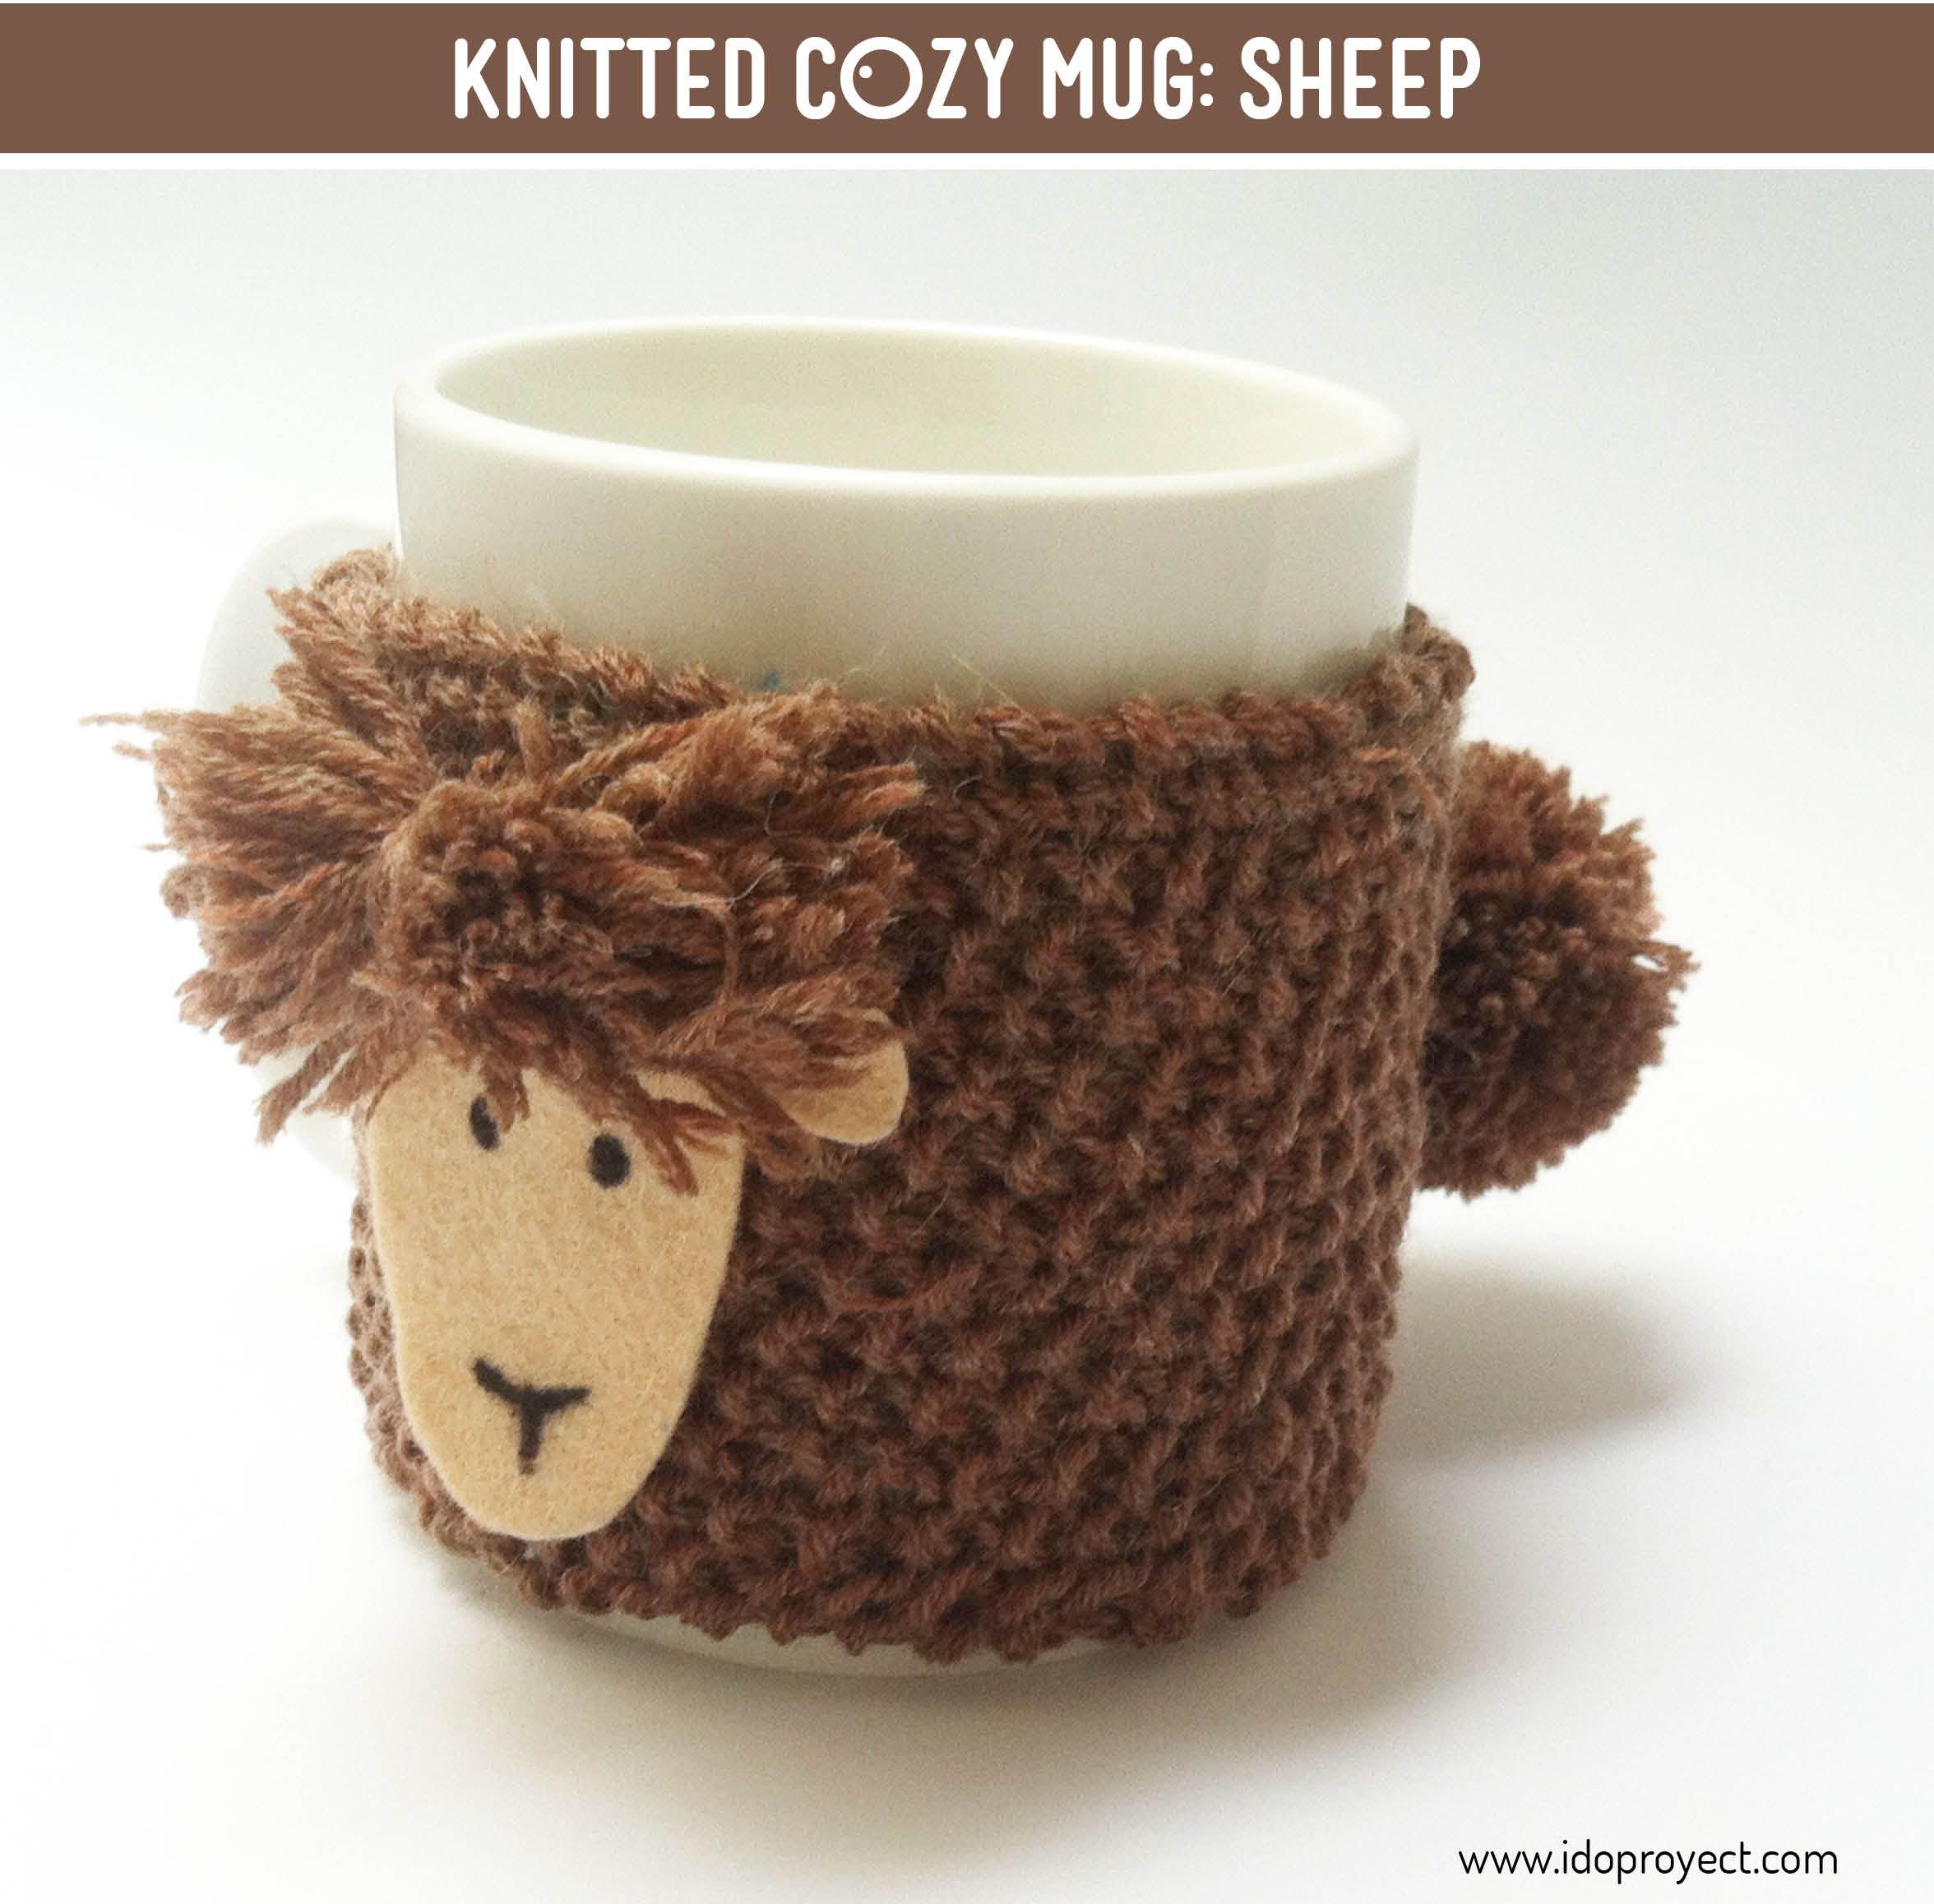 Funda para taza de punto. Oveja #knitting #mug #cozymug | cubre taza ...